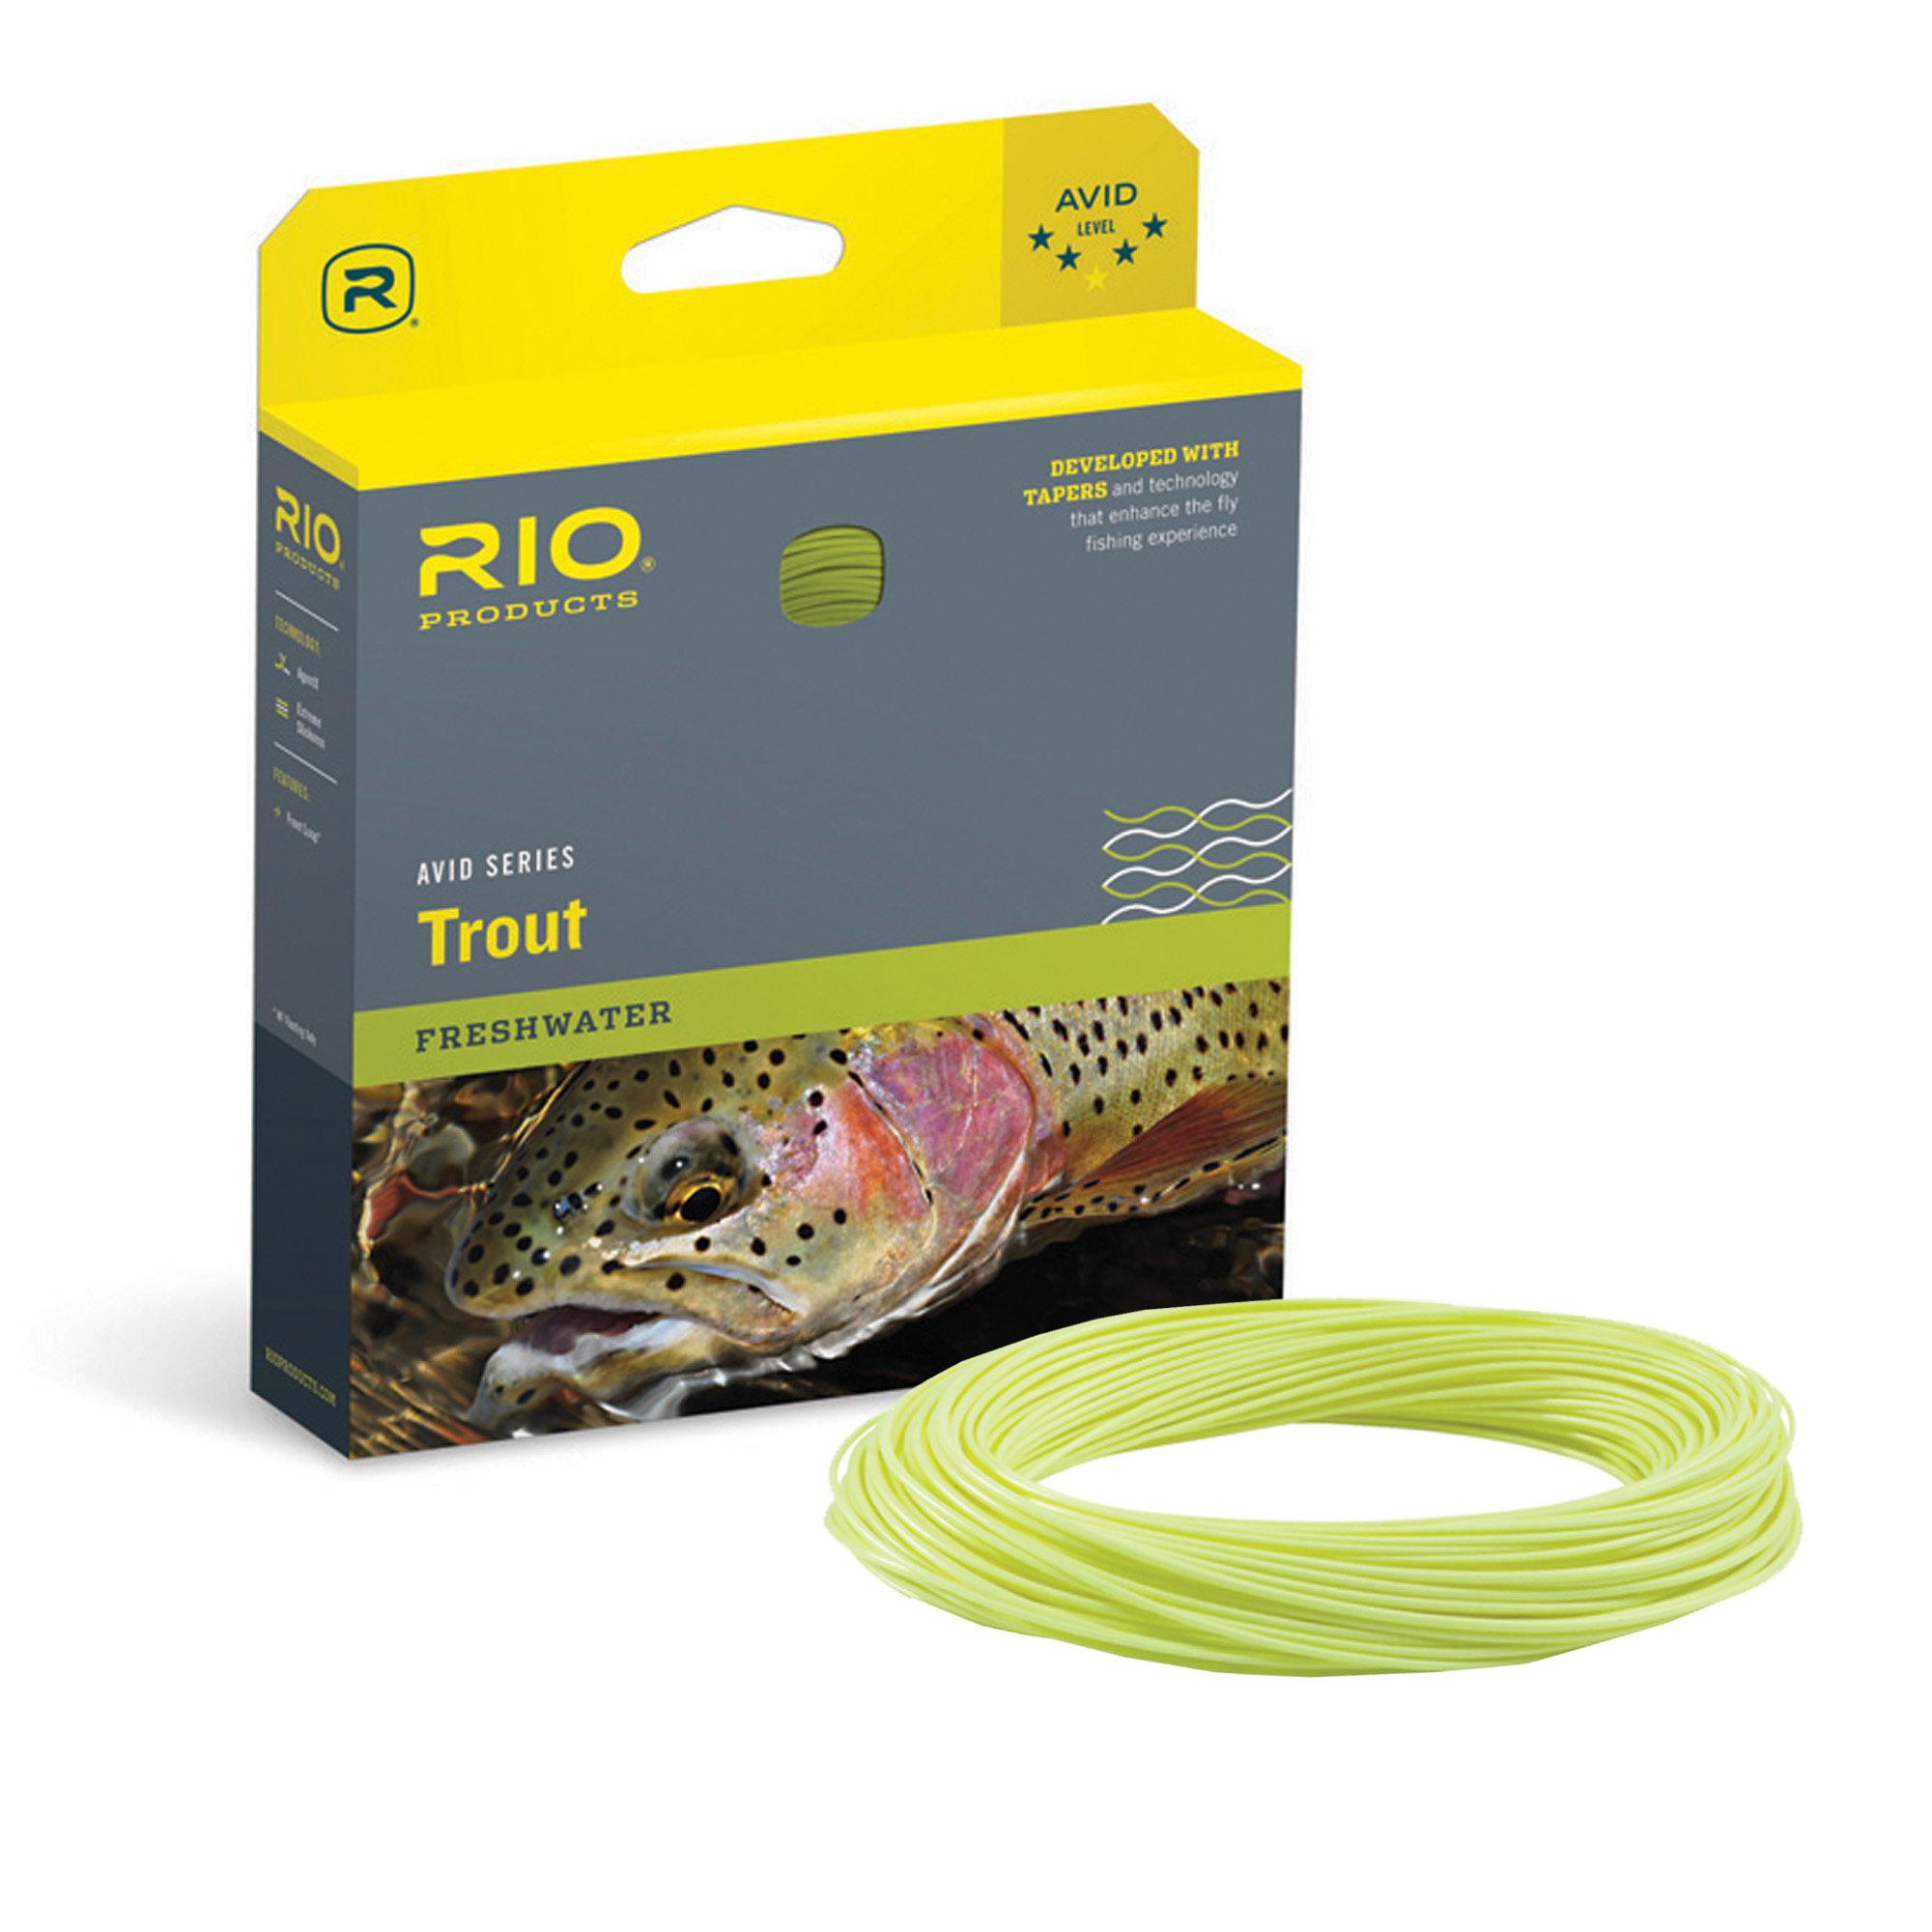 RIO AVID TROUT BOX & SPOOL